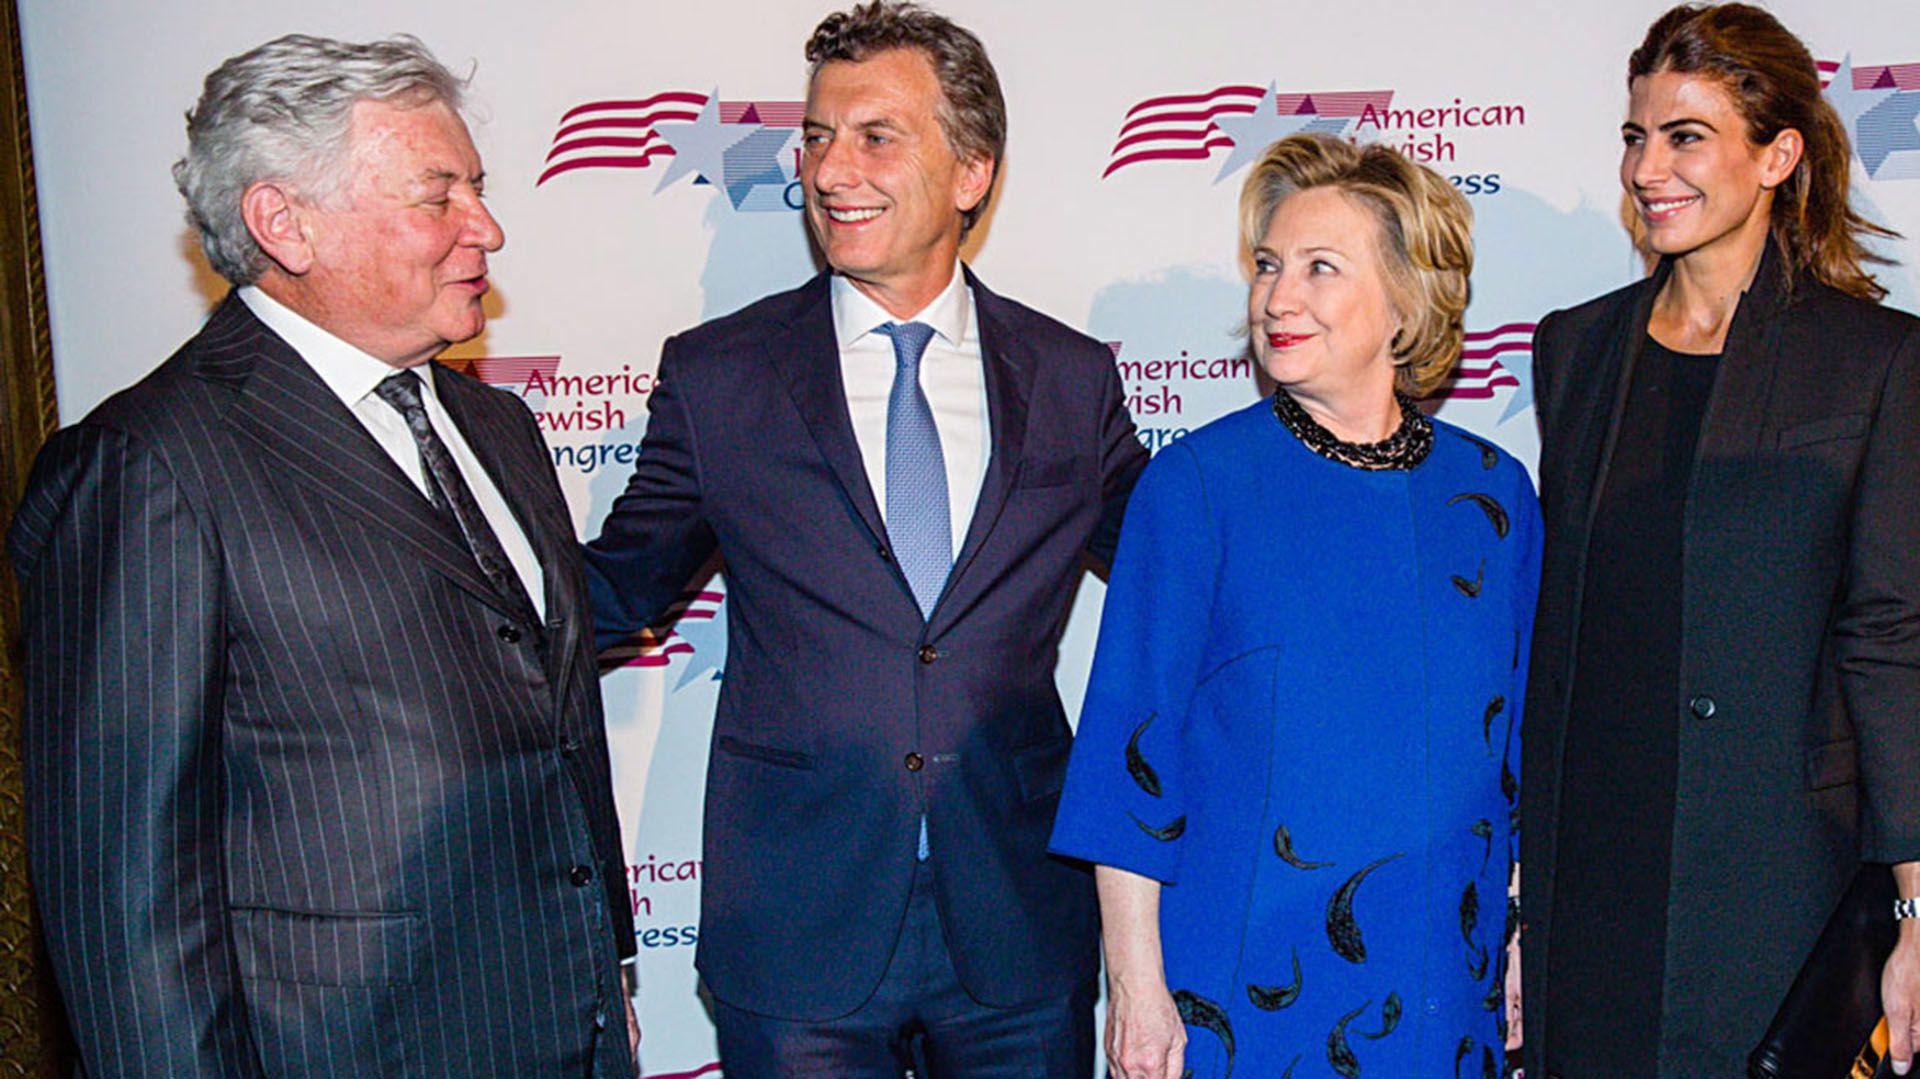 Jack Rosen, Mauricio Macri, Hillary Clinton y Juliana Awada, durante un evento en Washington